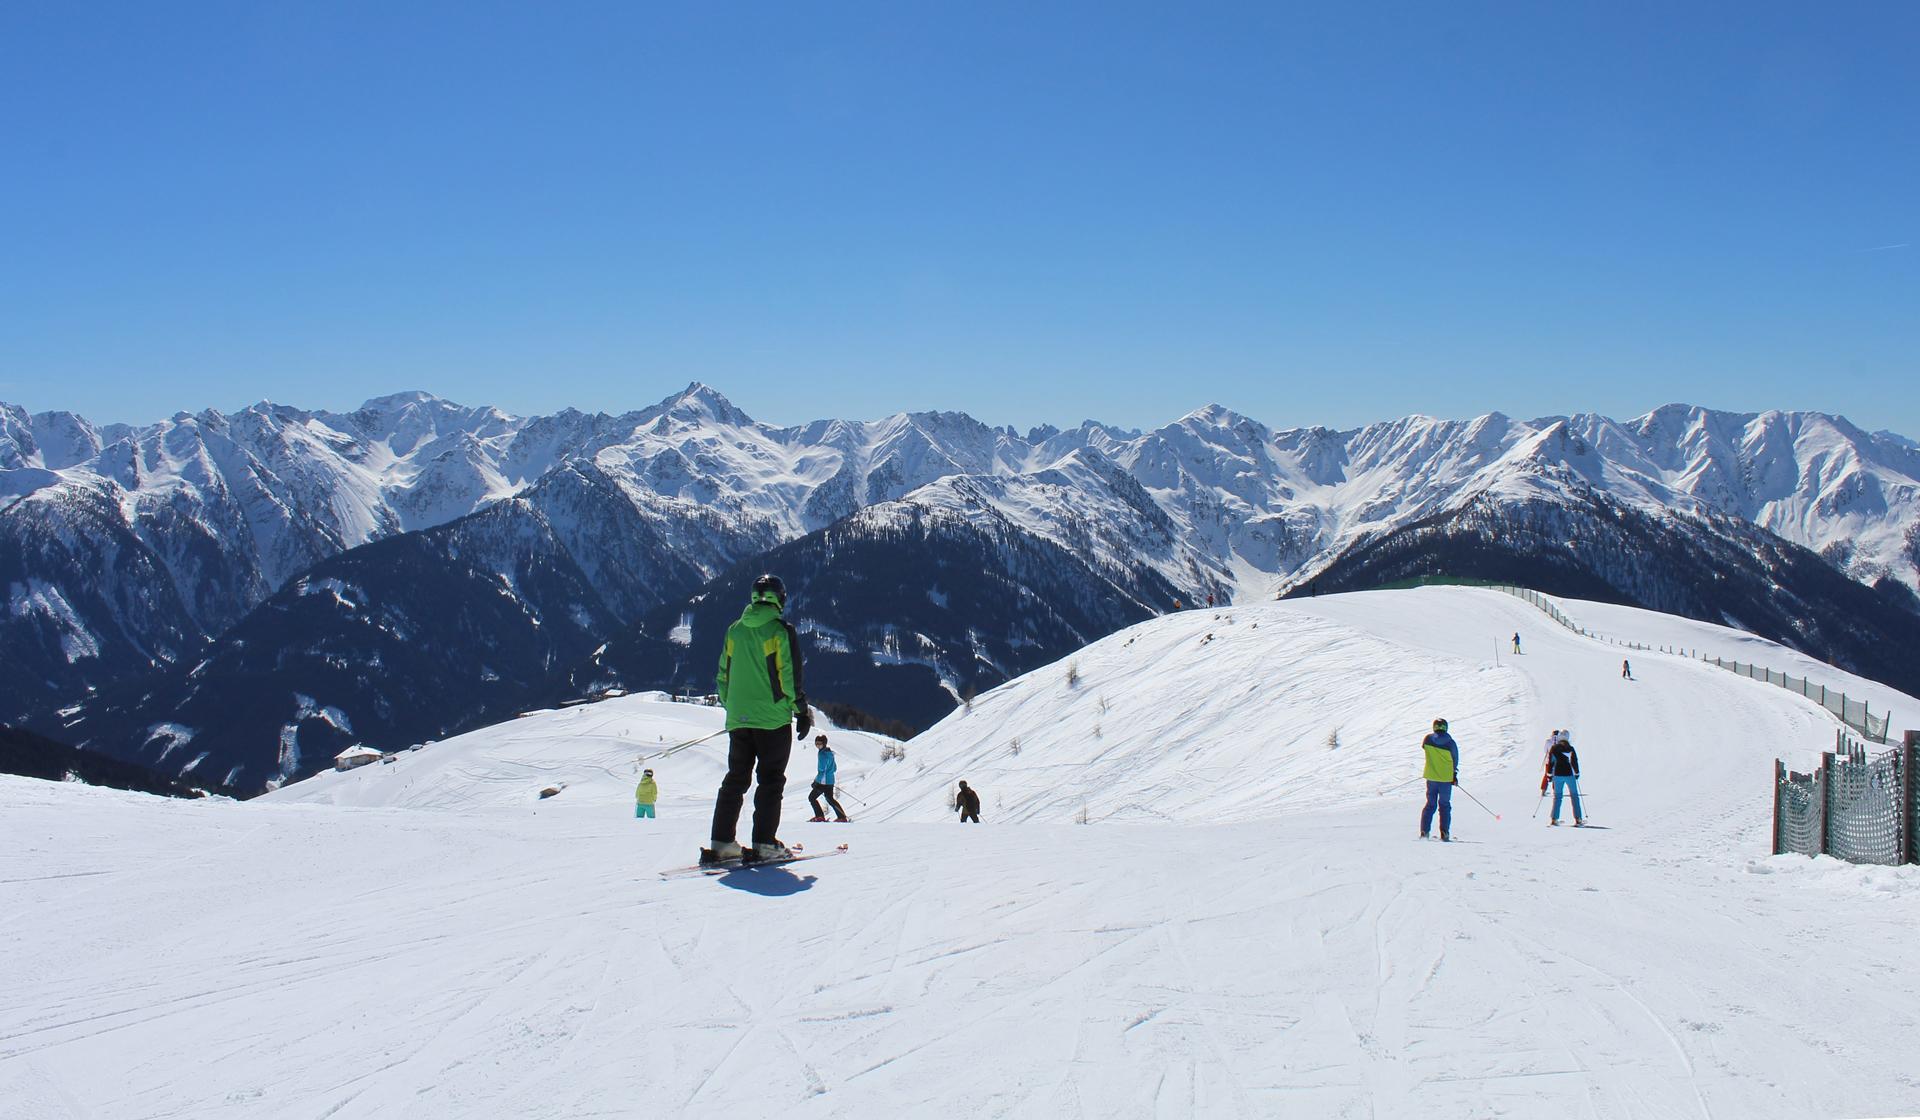 Ski fahren mit Panoramablick